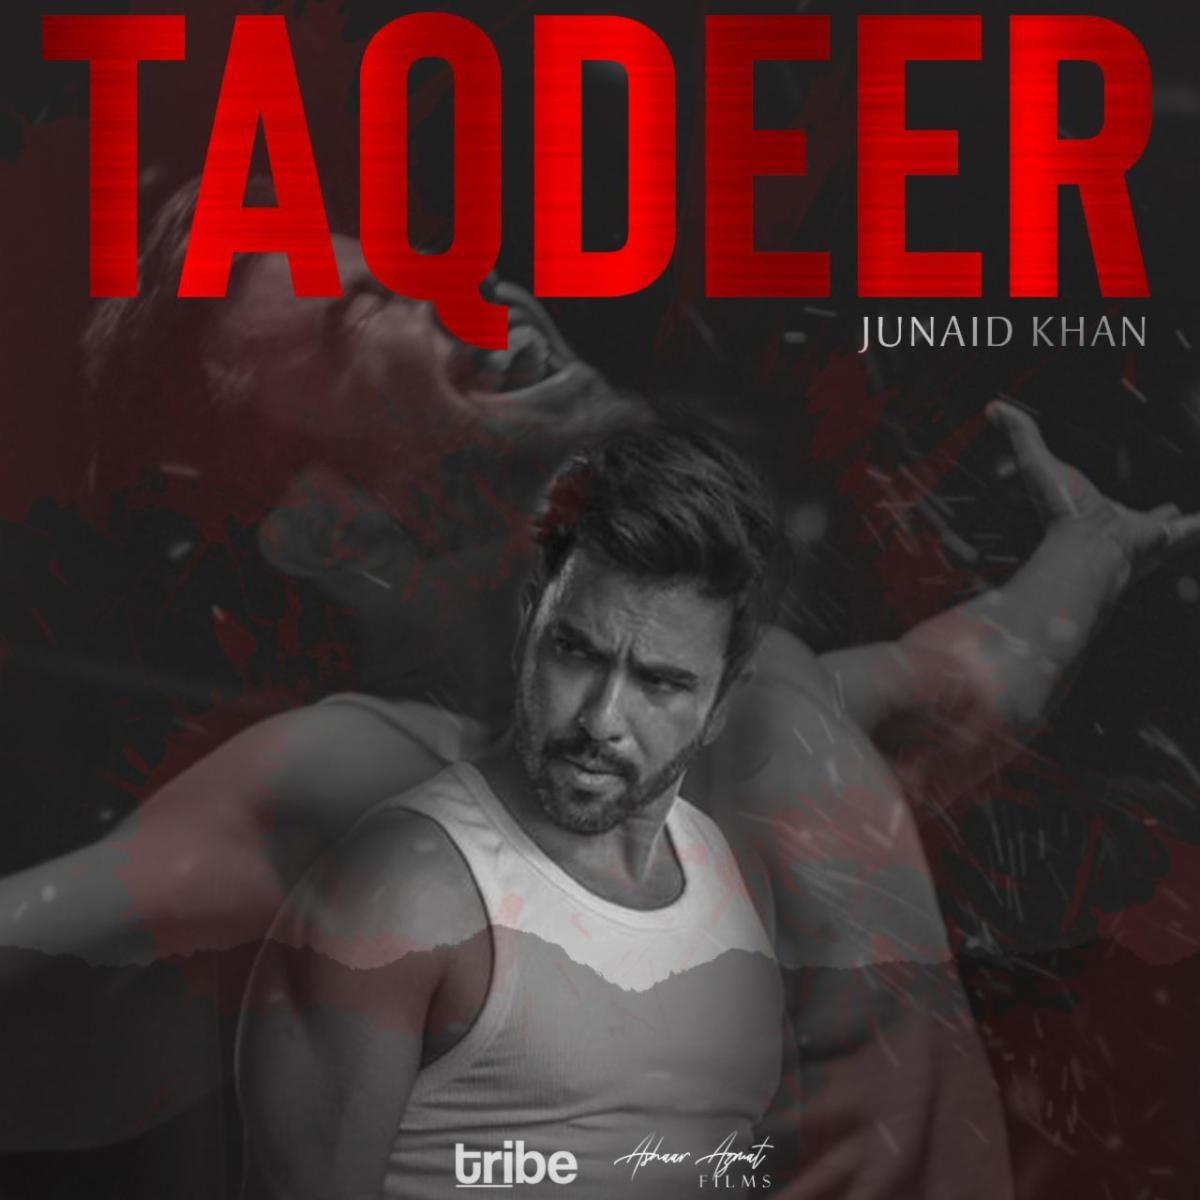 Junaid Khan releases new solo song 'Taqdeer' after a hiatus